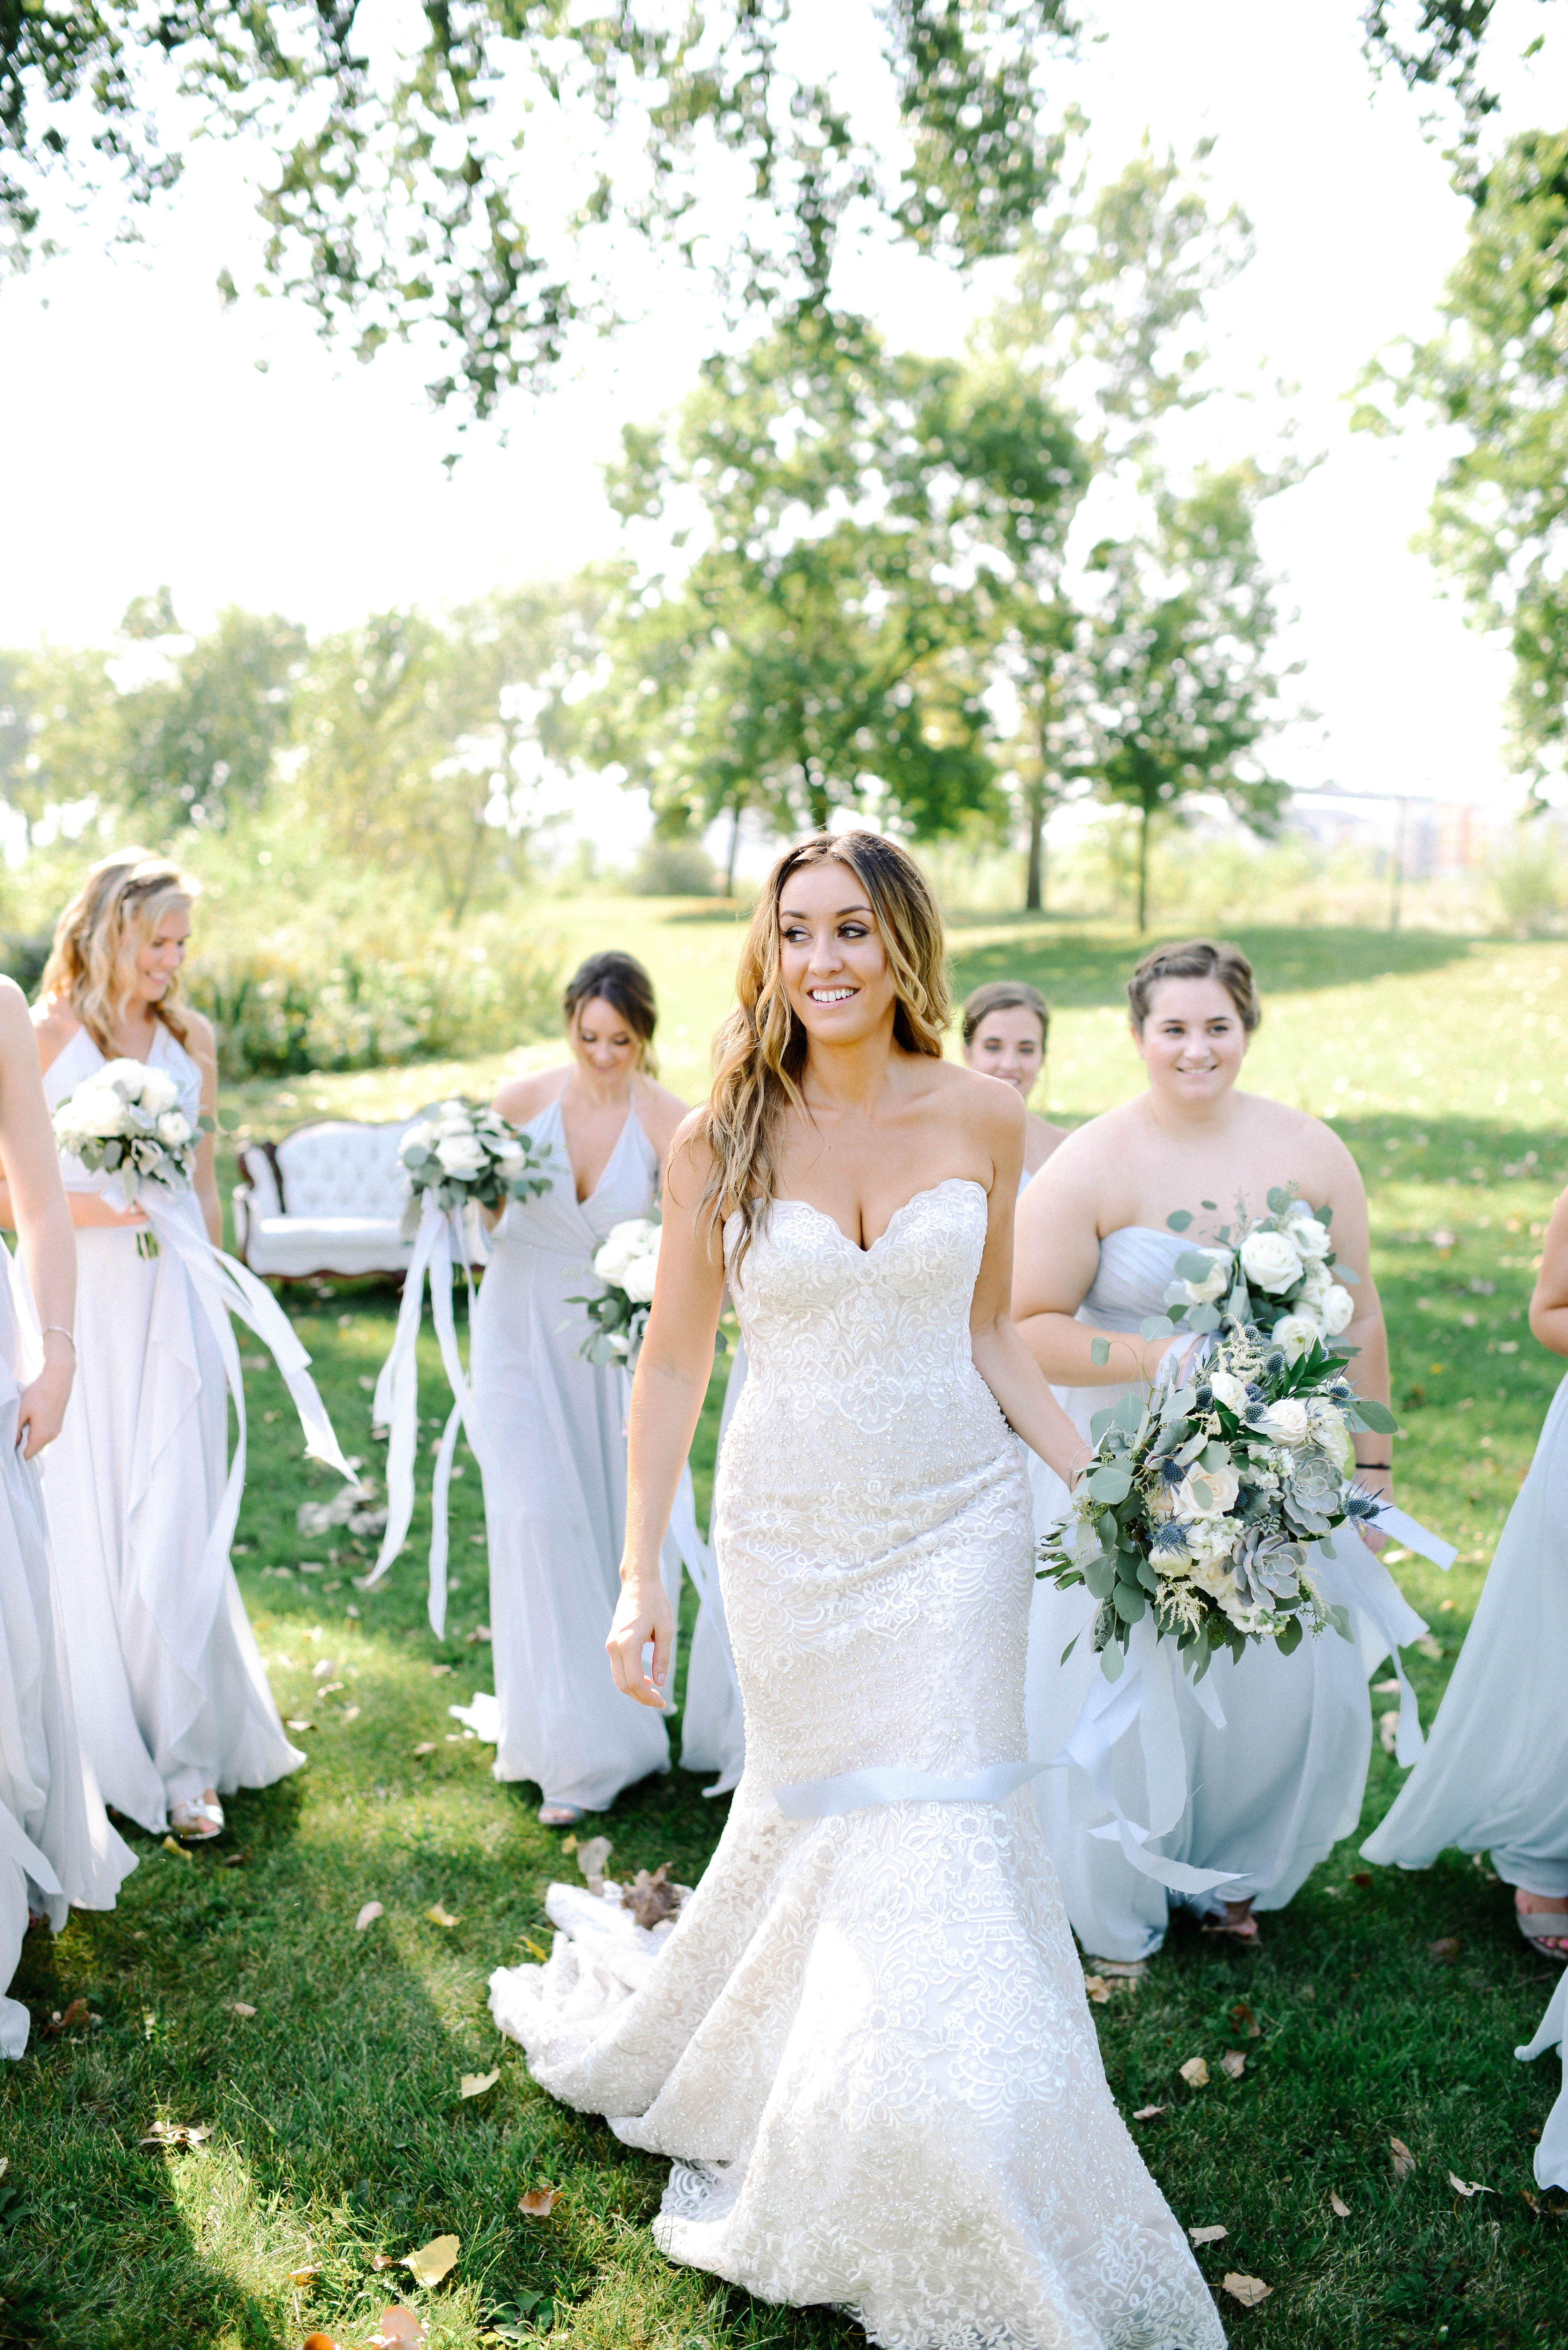 Mn September Wedding Light Blue Bridesmaids Dresses Modern Clic Bribe Weddingphotography Bride